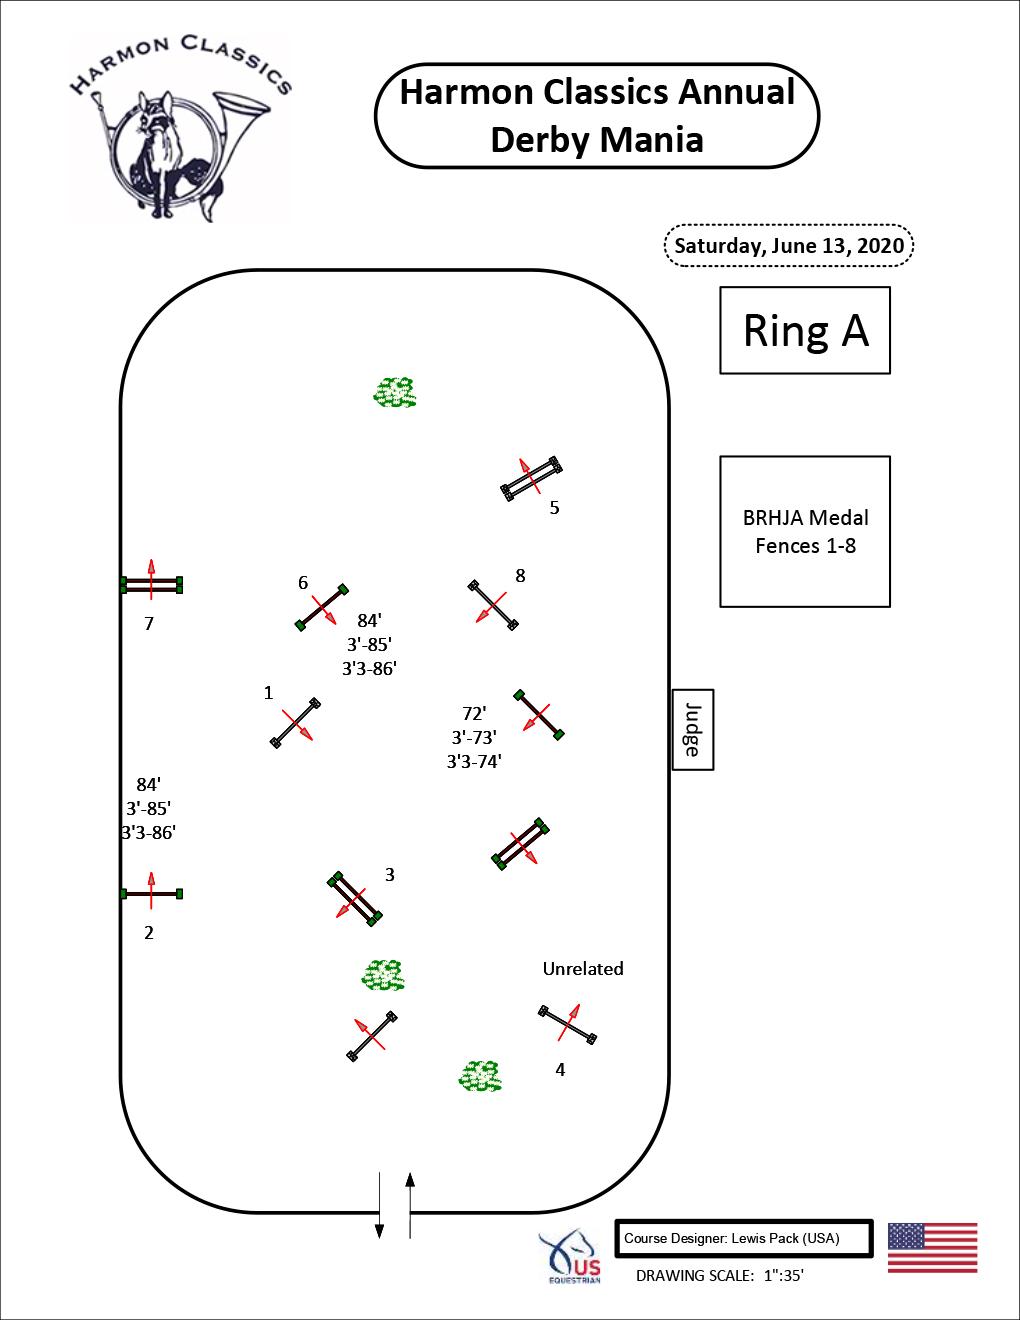 Ring-A-Saturday6-13-BRHJA-Medal-Harmon-Classics-Derby-Mania